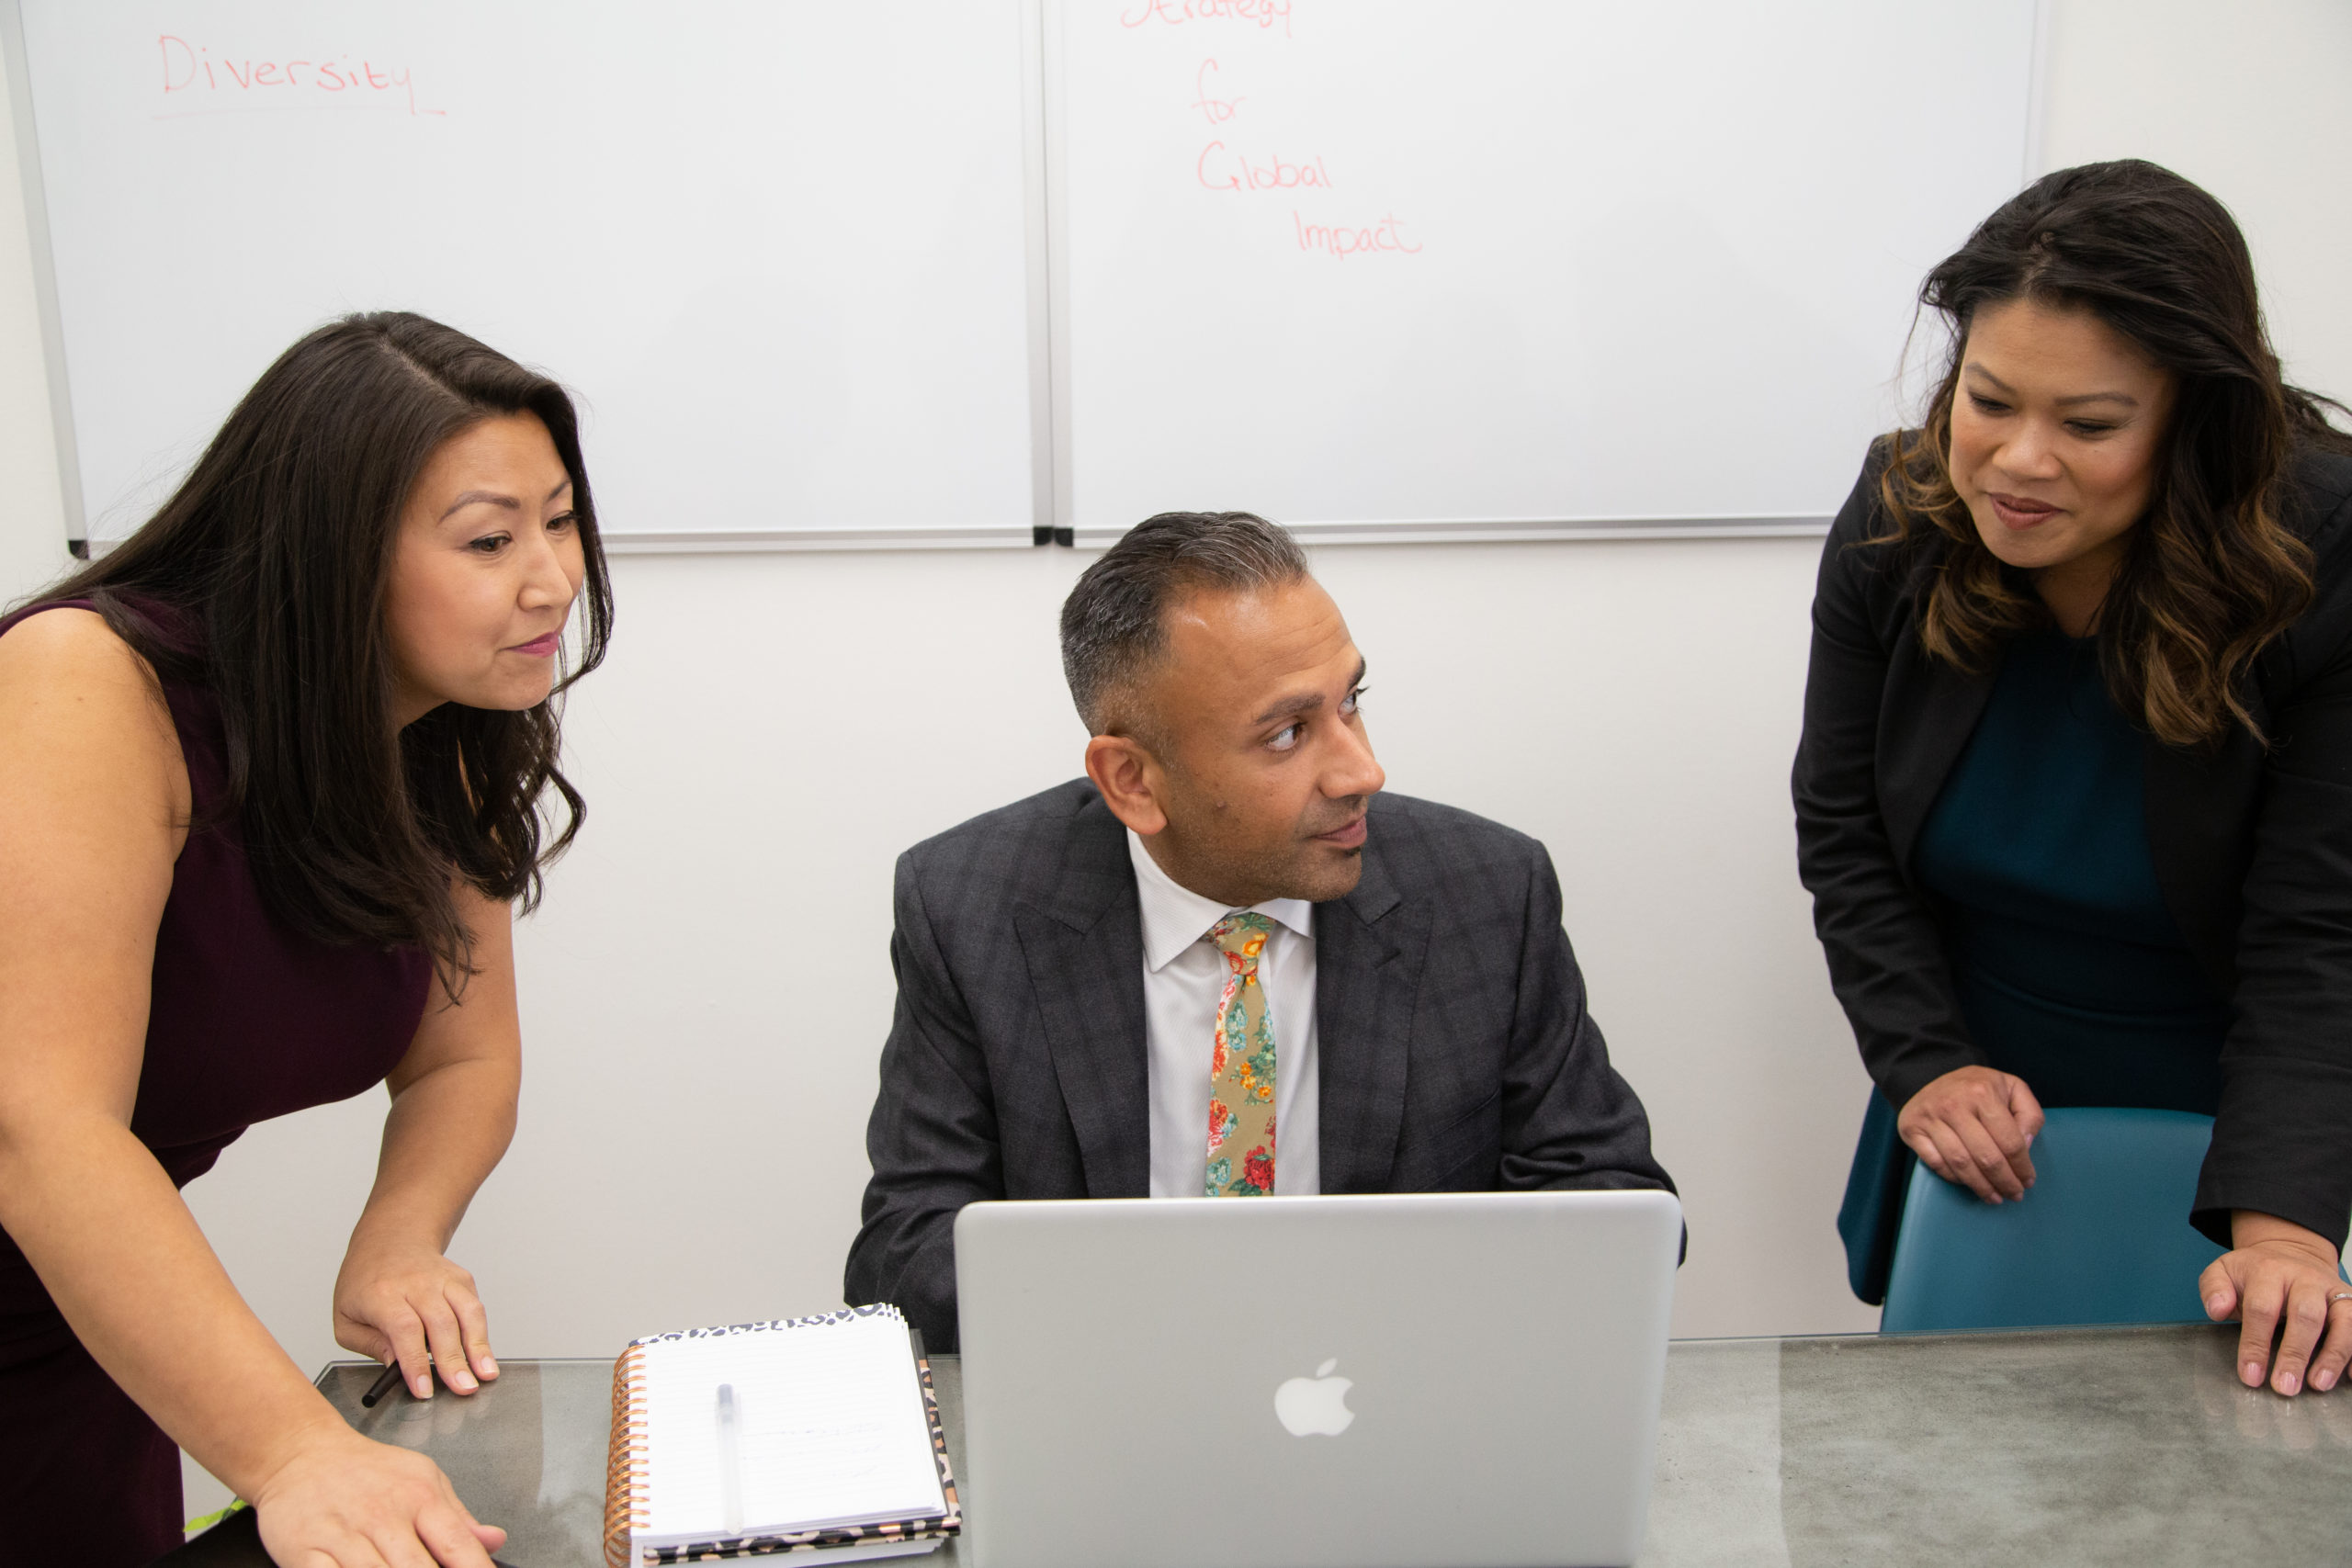 Diverse team members viewing a laptop screen